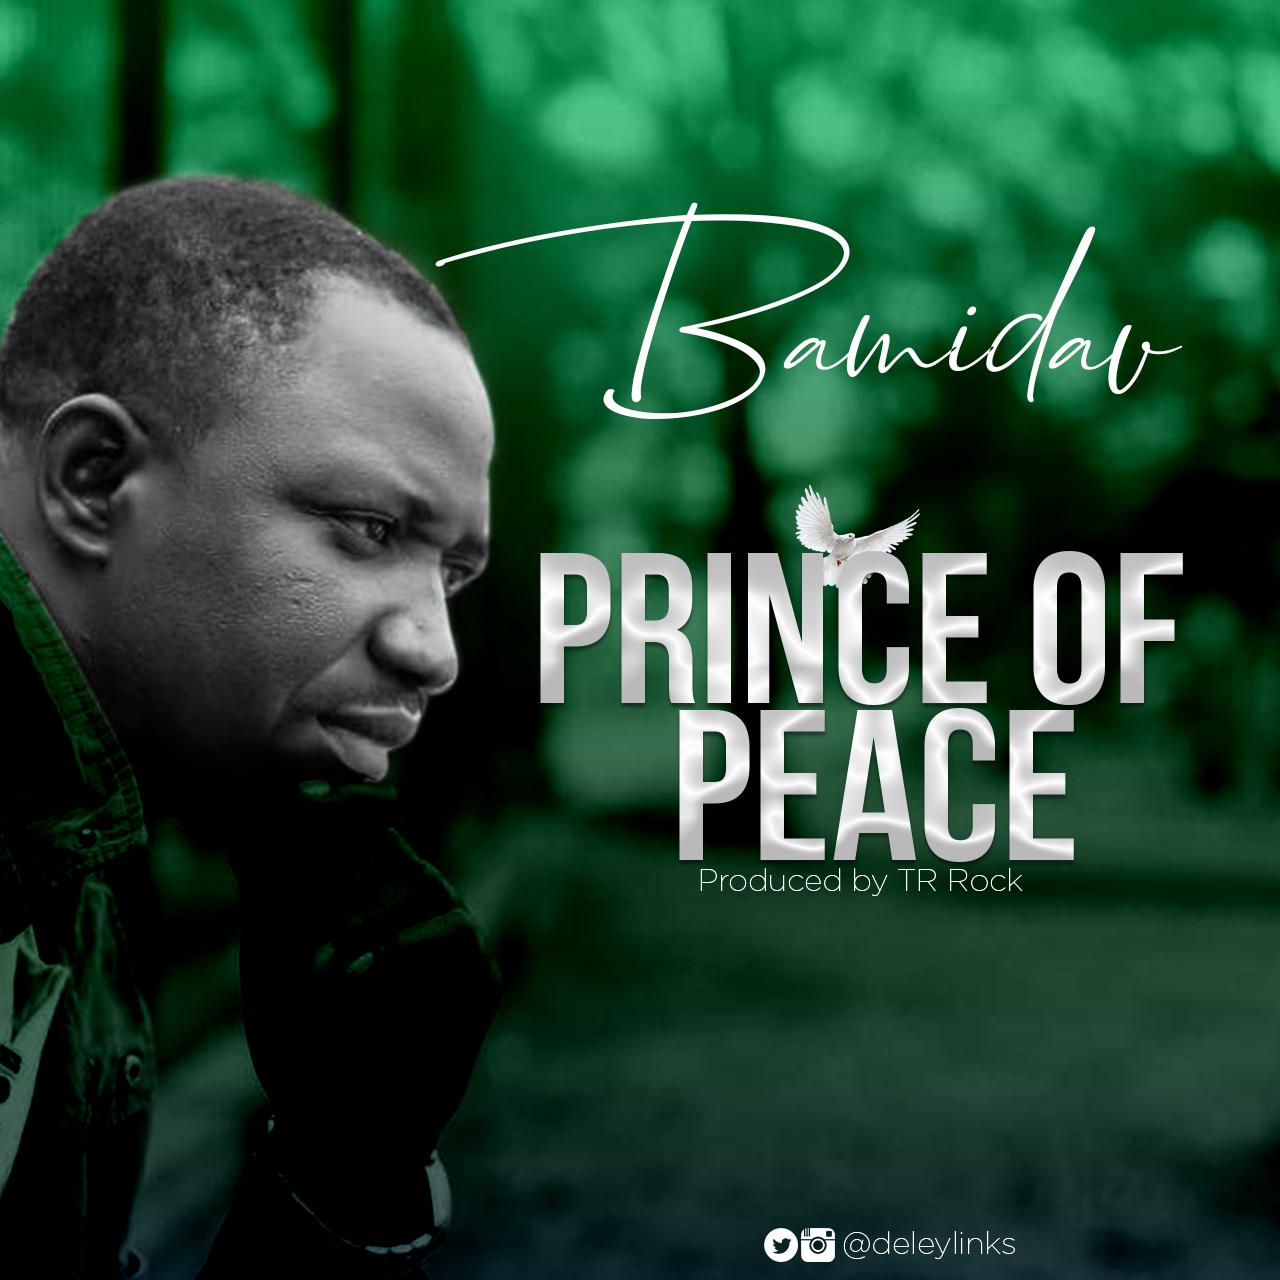 Bamdav Peace Of Peace